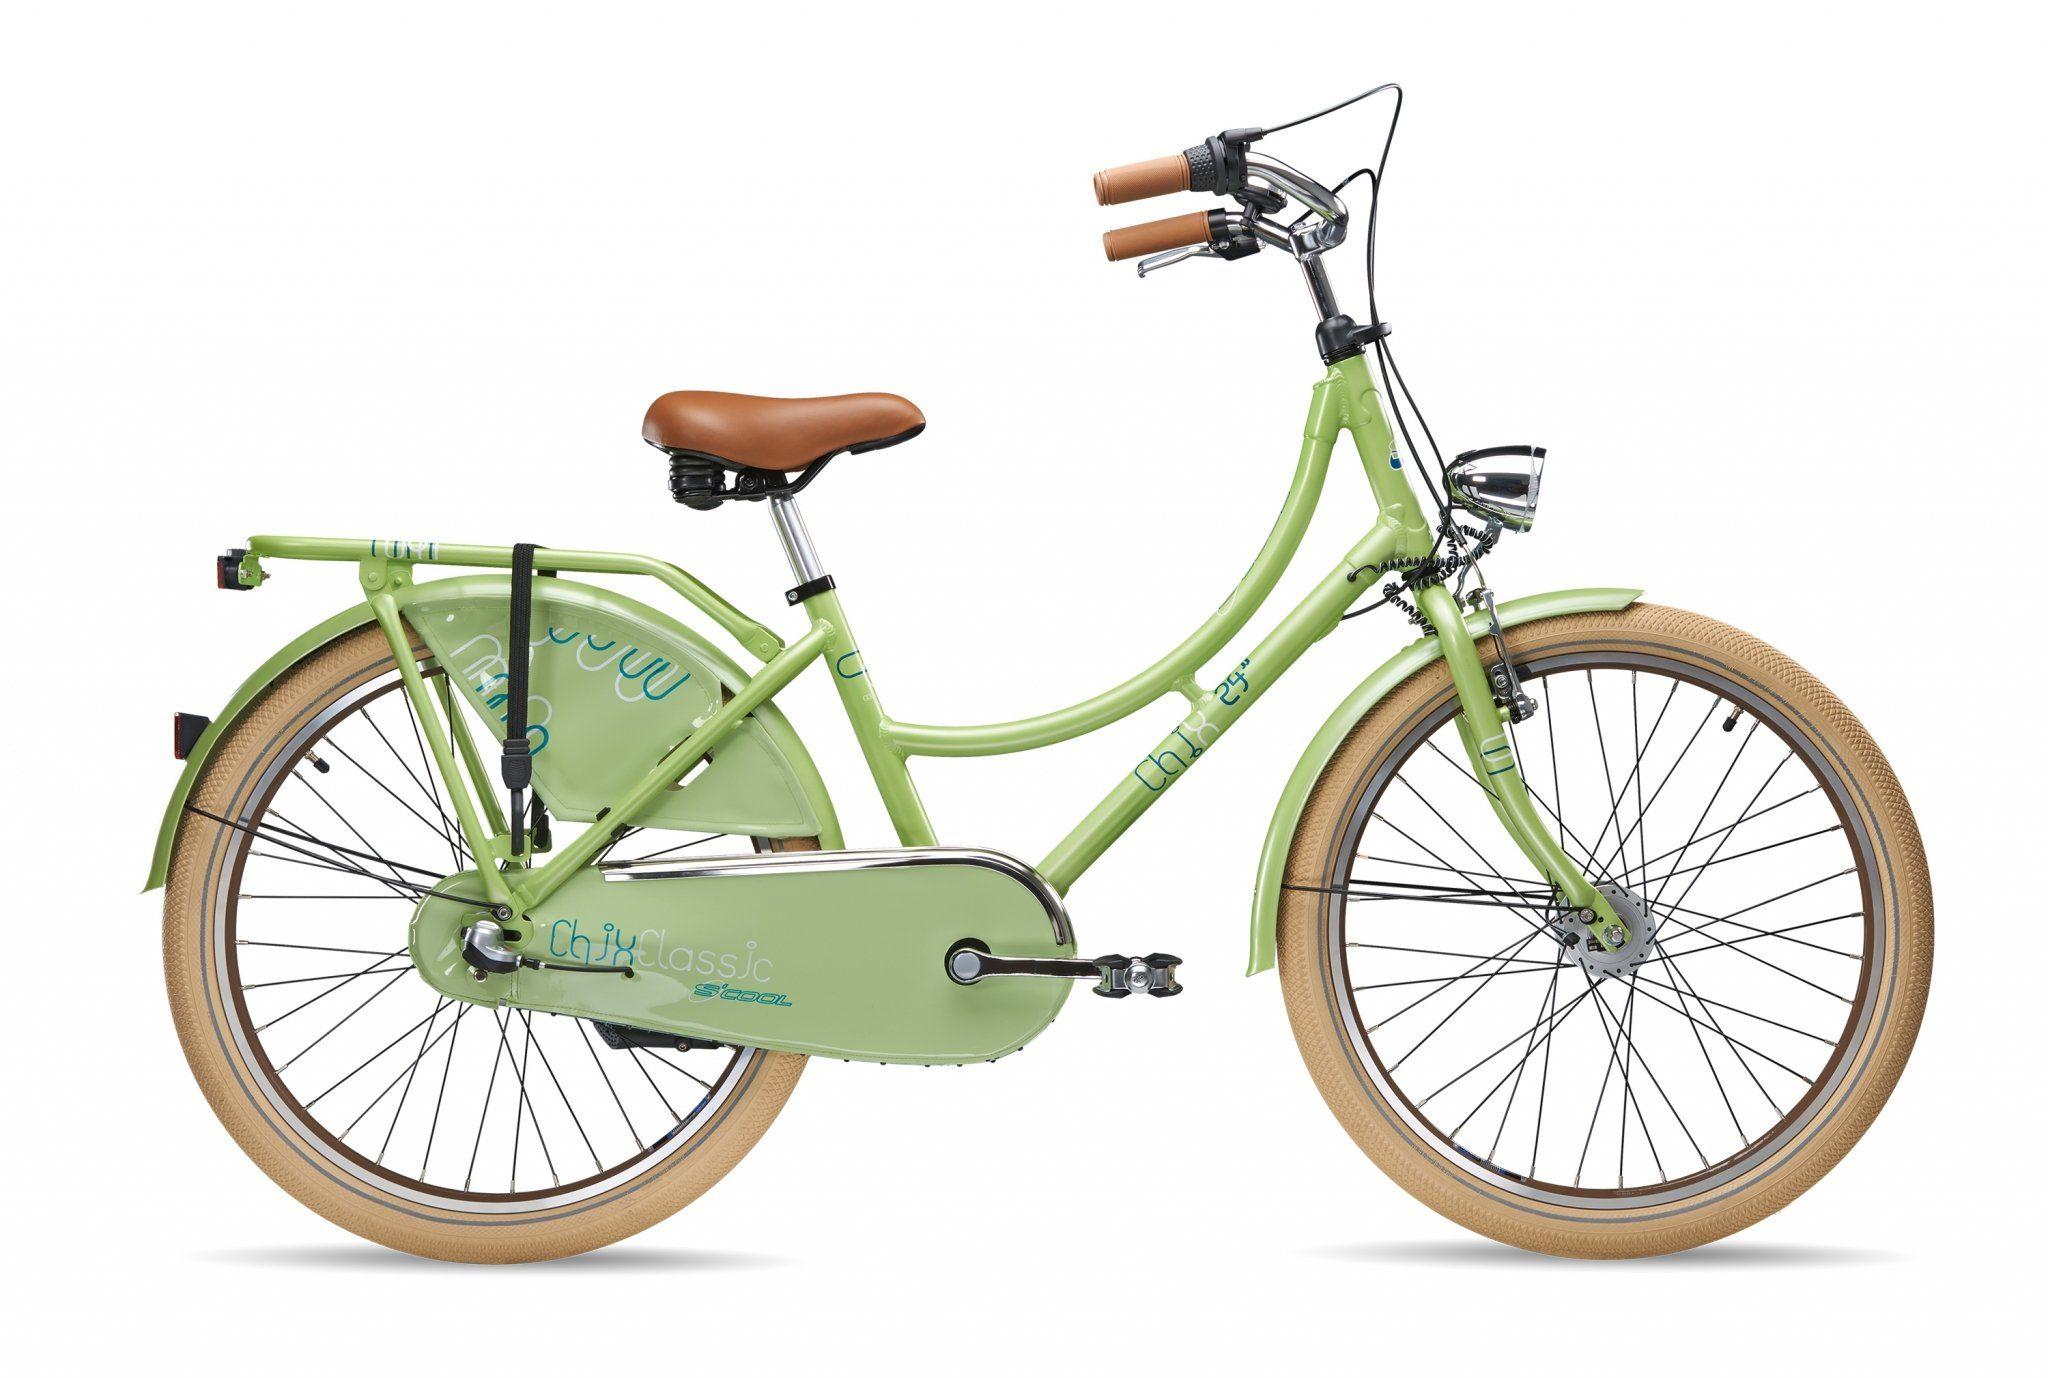 S'COOL Kinderrad »s'cool chiX classic 24-3«